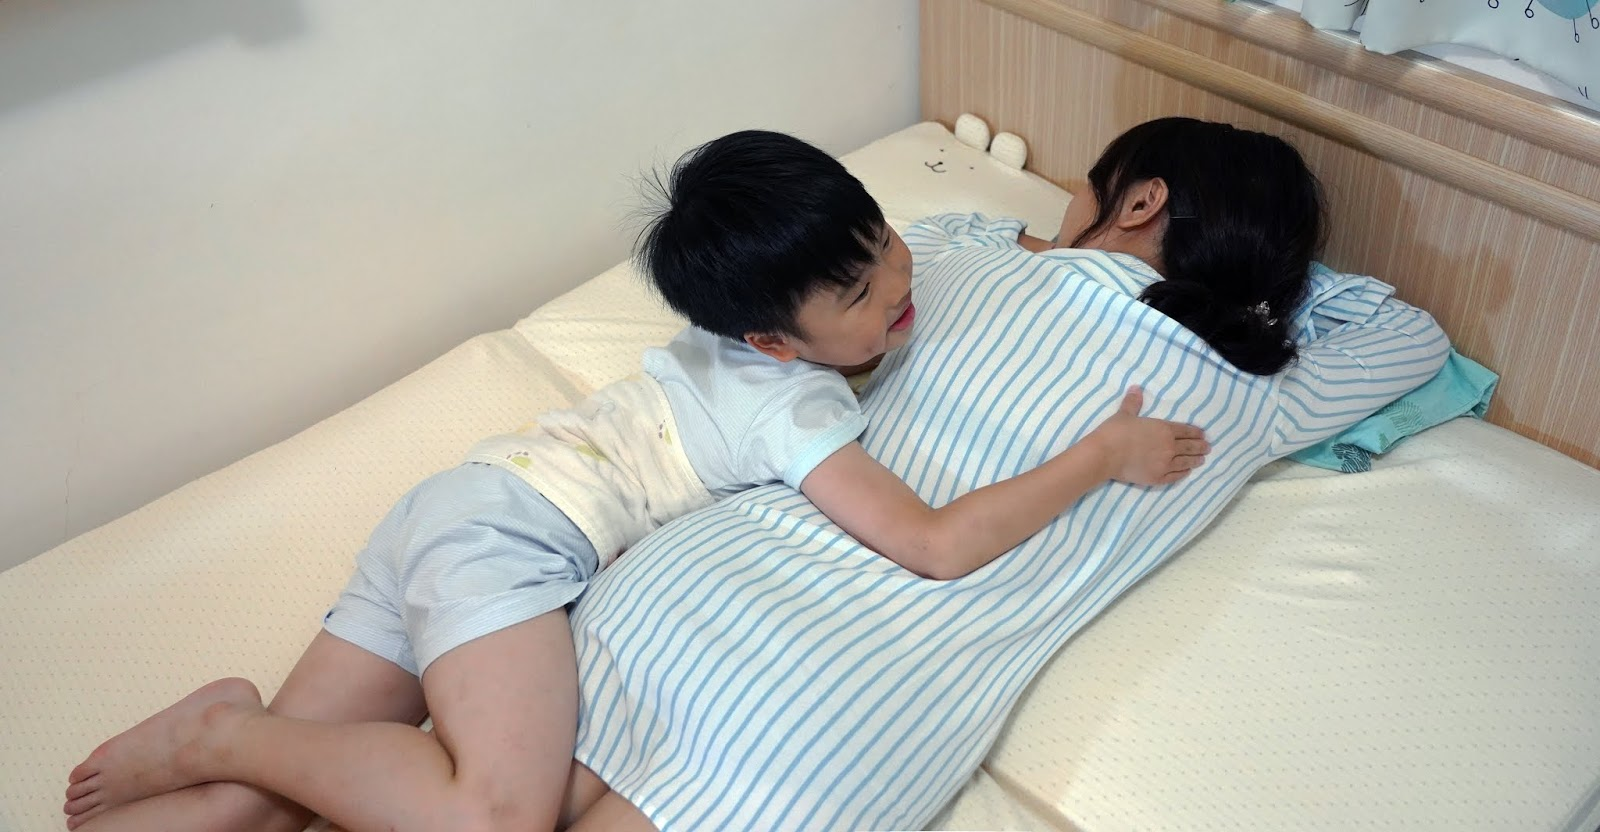 6.cani_dj%25E7%2590%25A6%25E7%2590%25A6_wwwhostkikicom_.JPG-讓孩子不怕自己睡,小一生與父母分房怎麼做